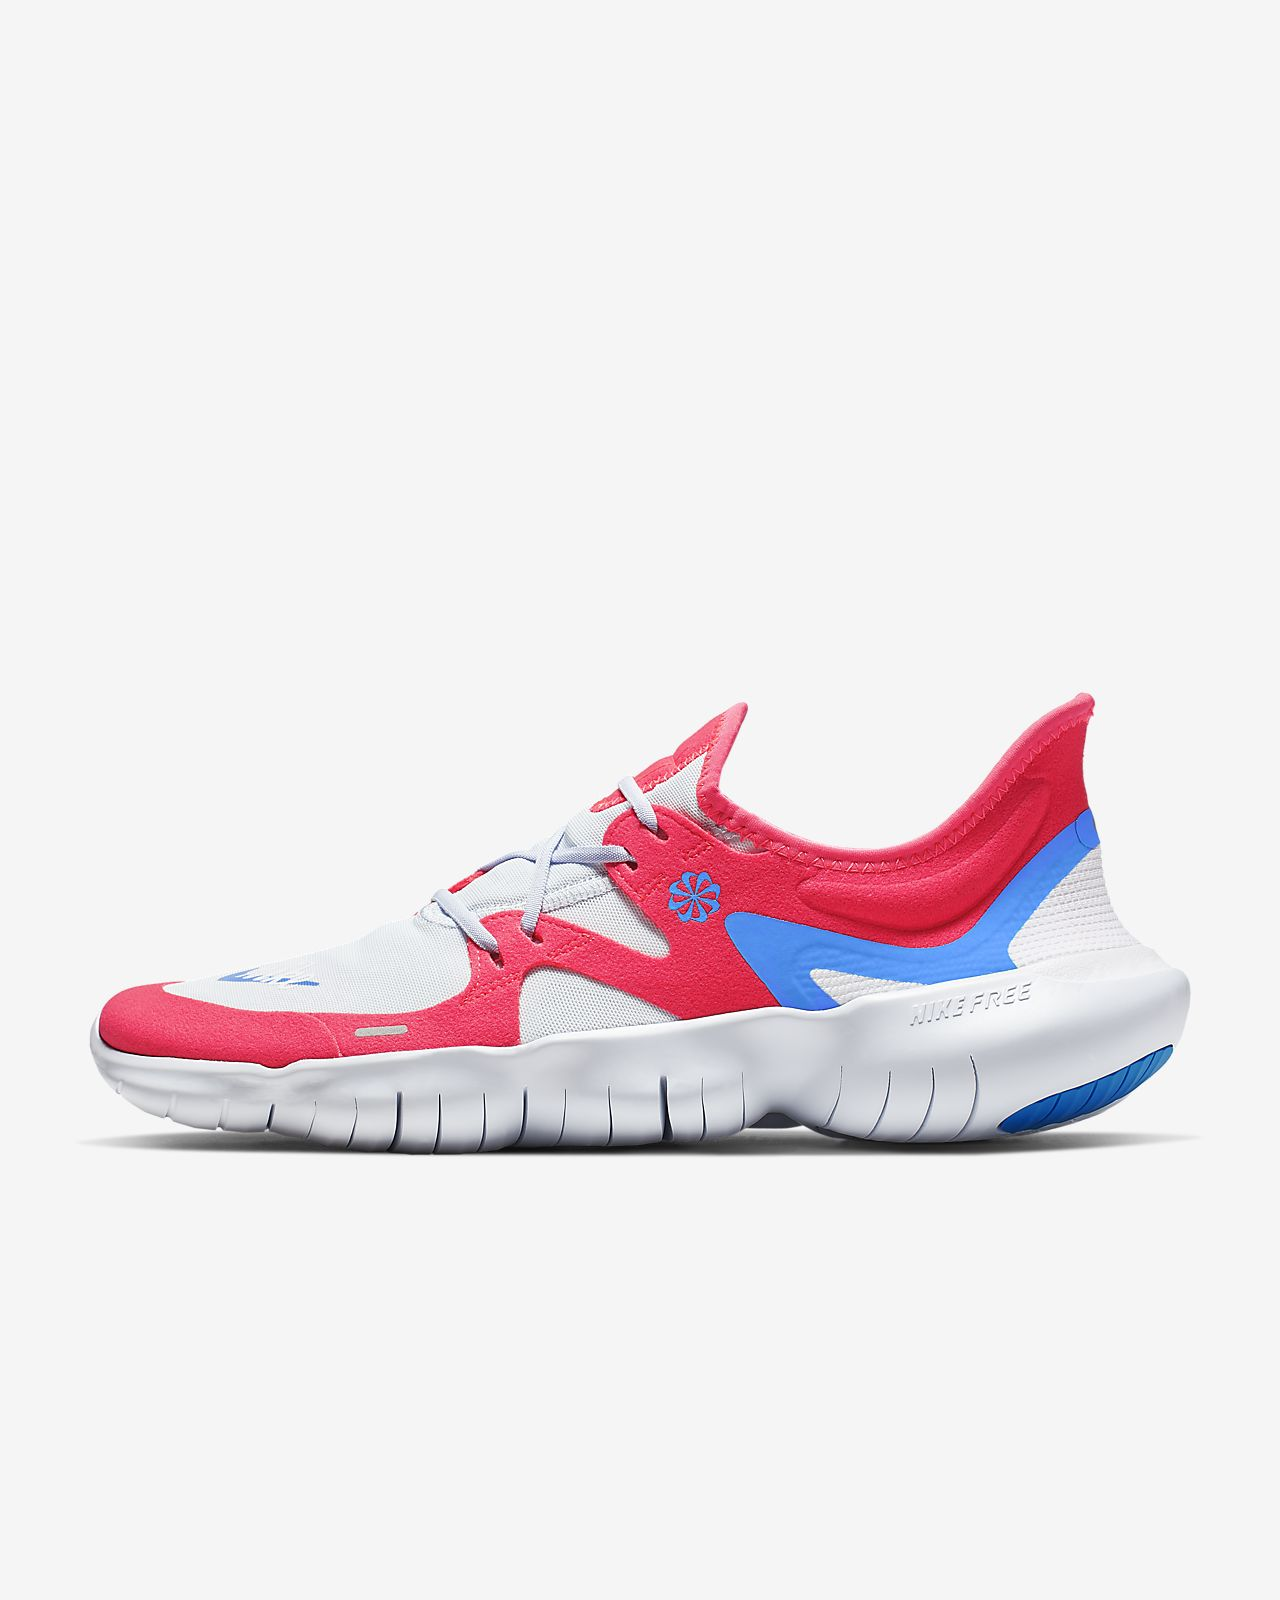 Nike Free RN 5.0 Zapatillas de running Hombre